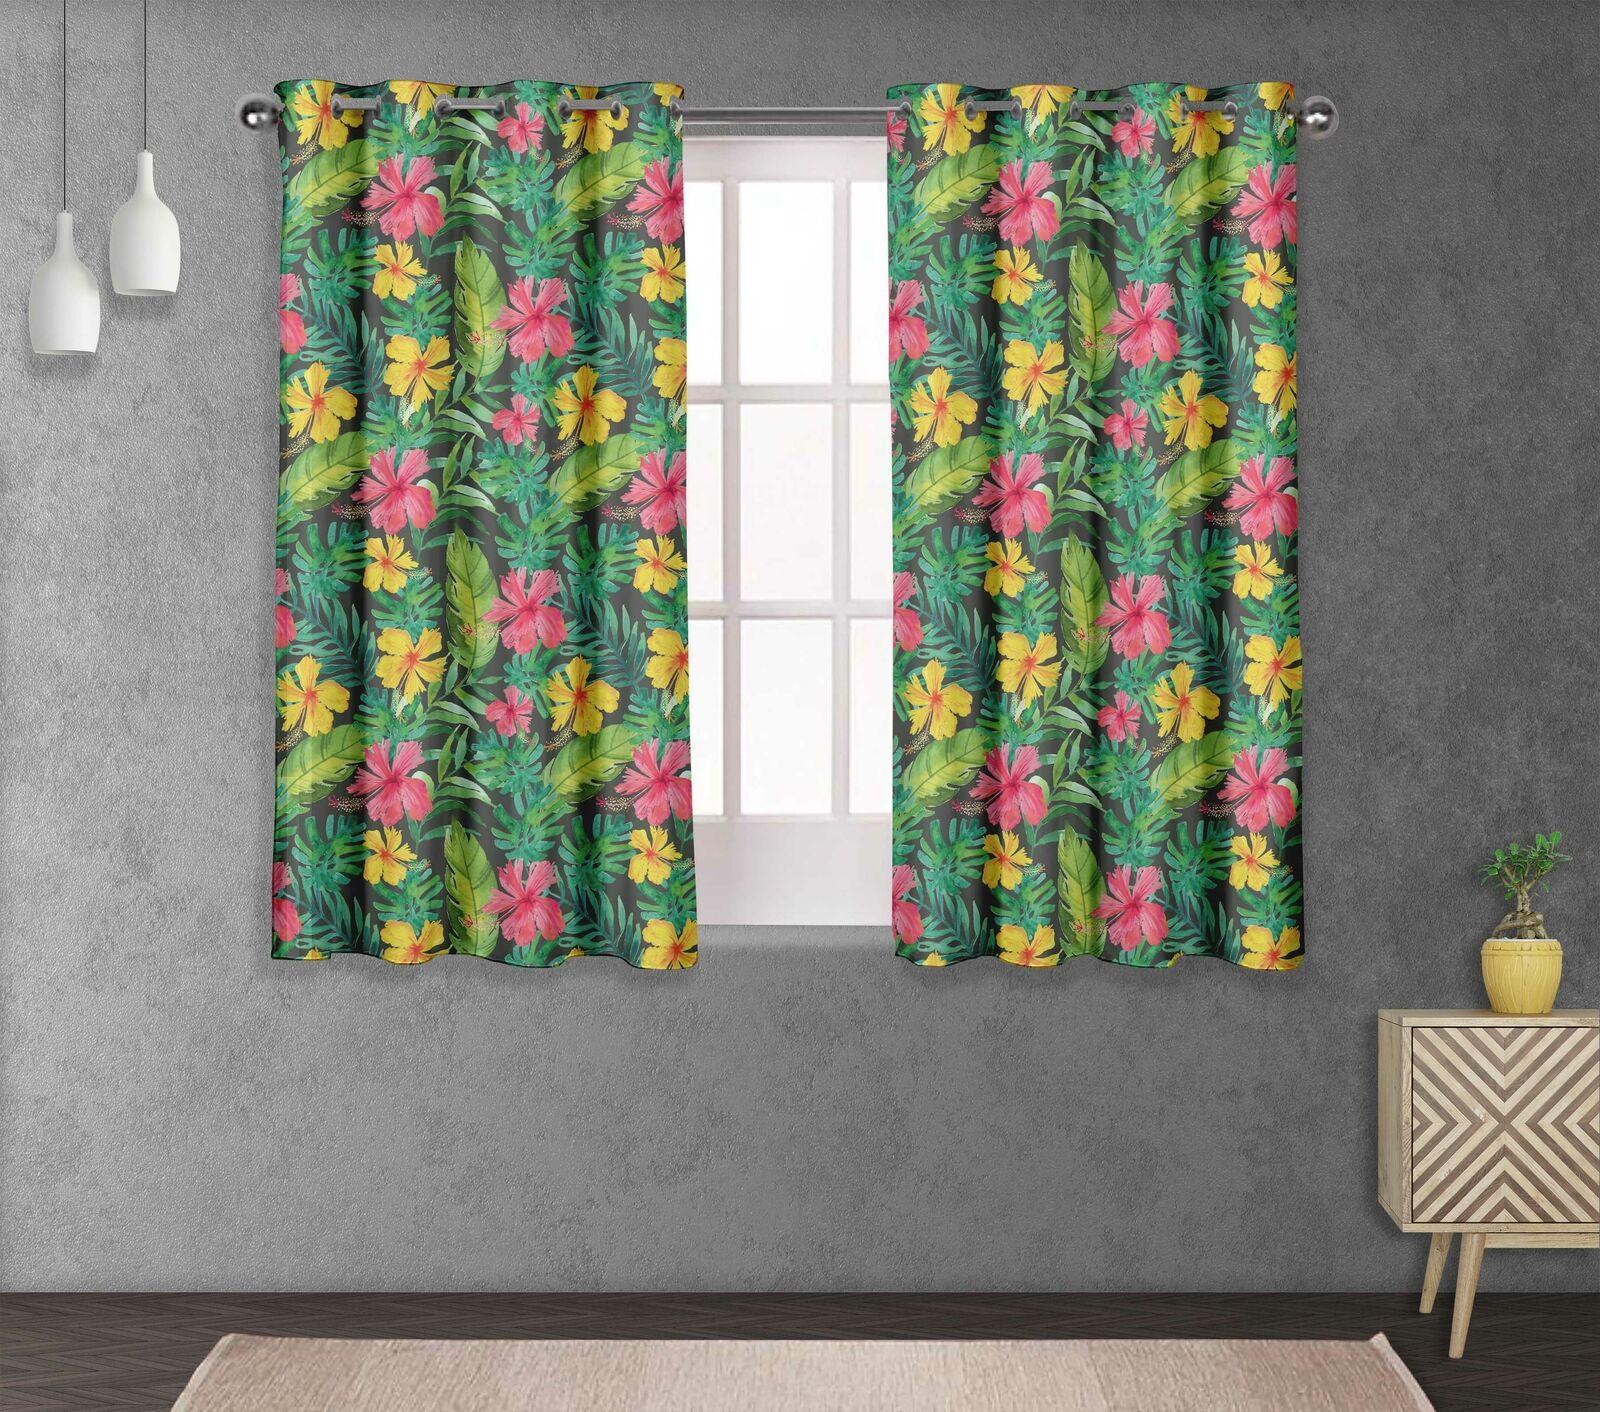 S4sassy Leaves & Double Panel Window Treatment Curtain -FL-687D